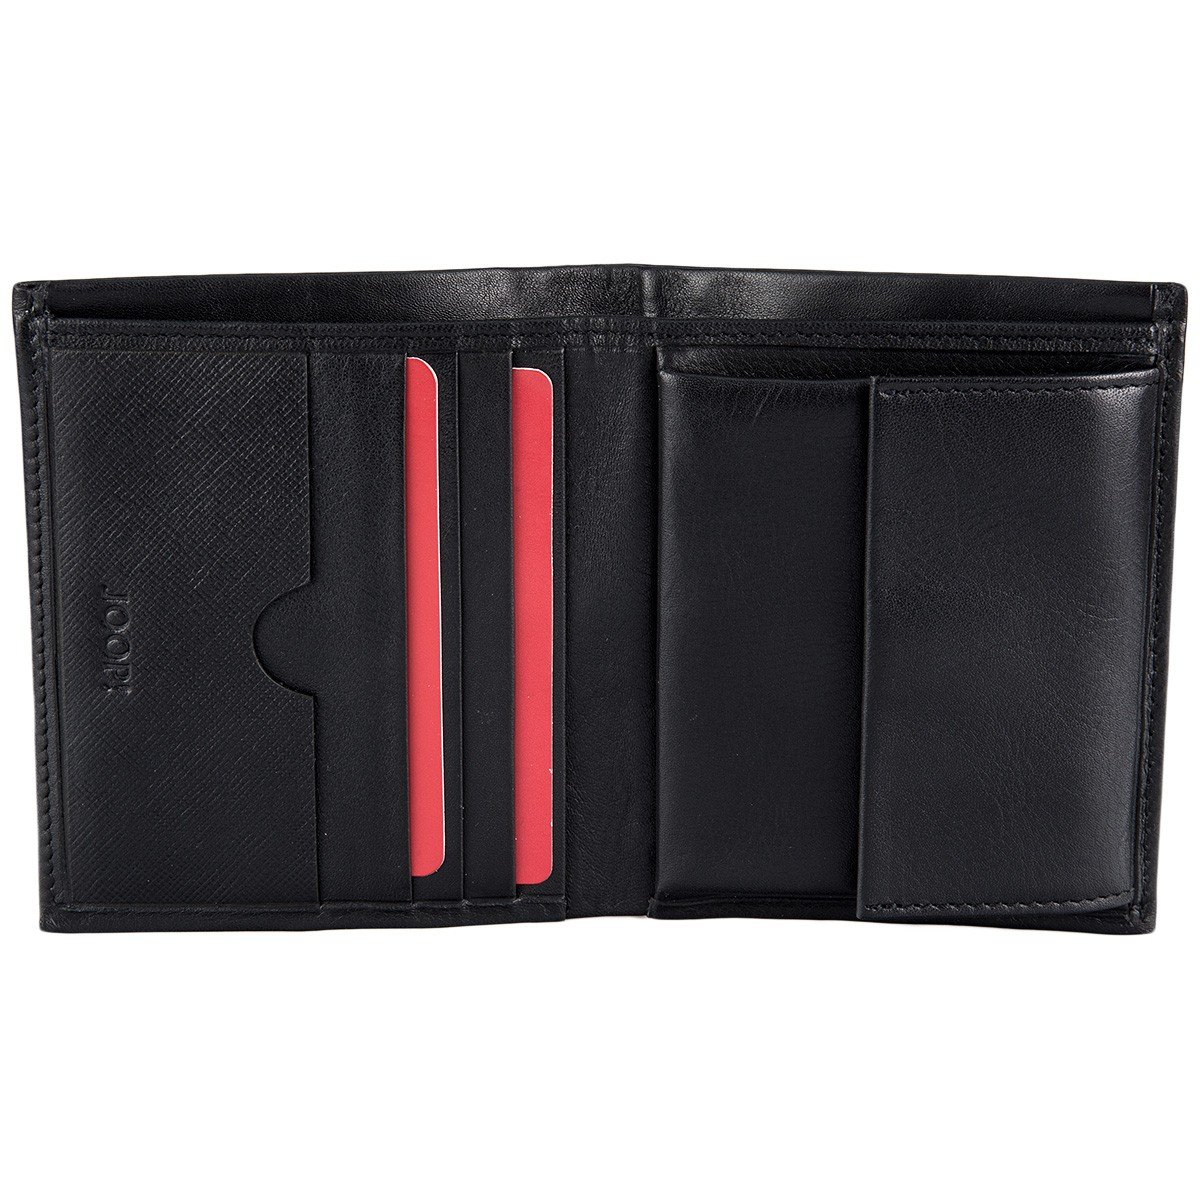 Billetera para hombre, cuero genuino, Pero Daphnis Billfold V6 9x10,5x2cm - Negro: Clothing